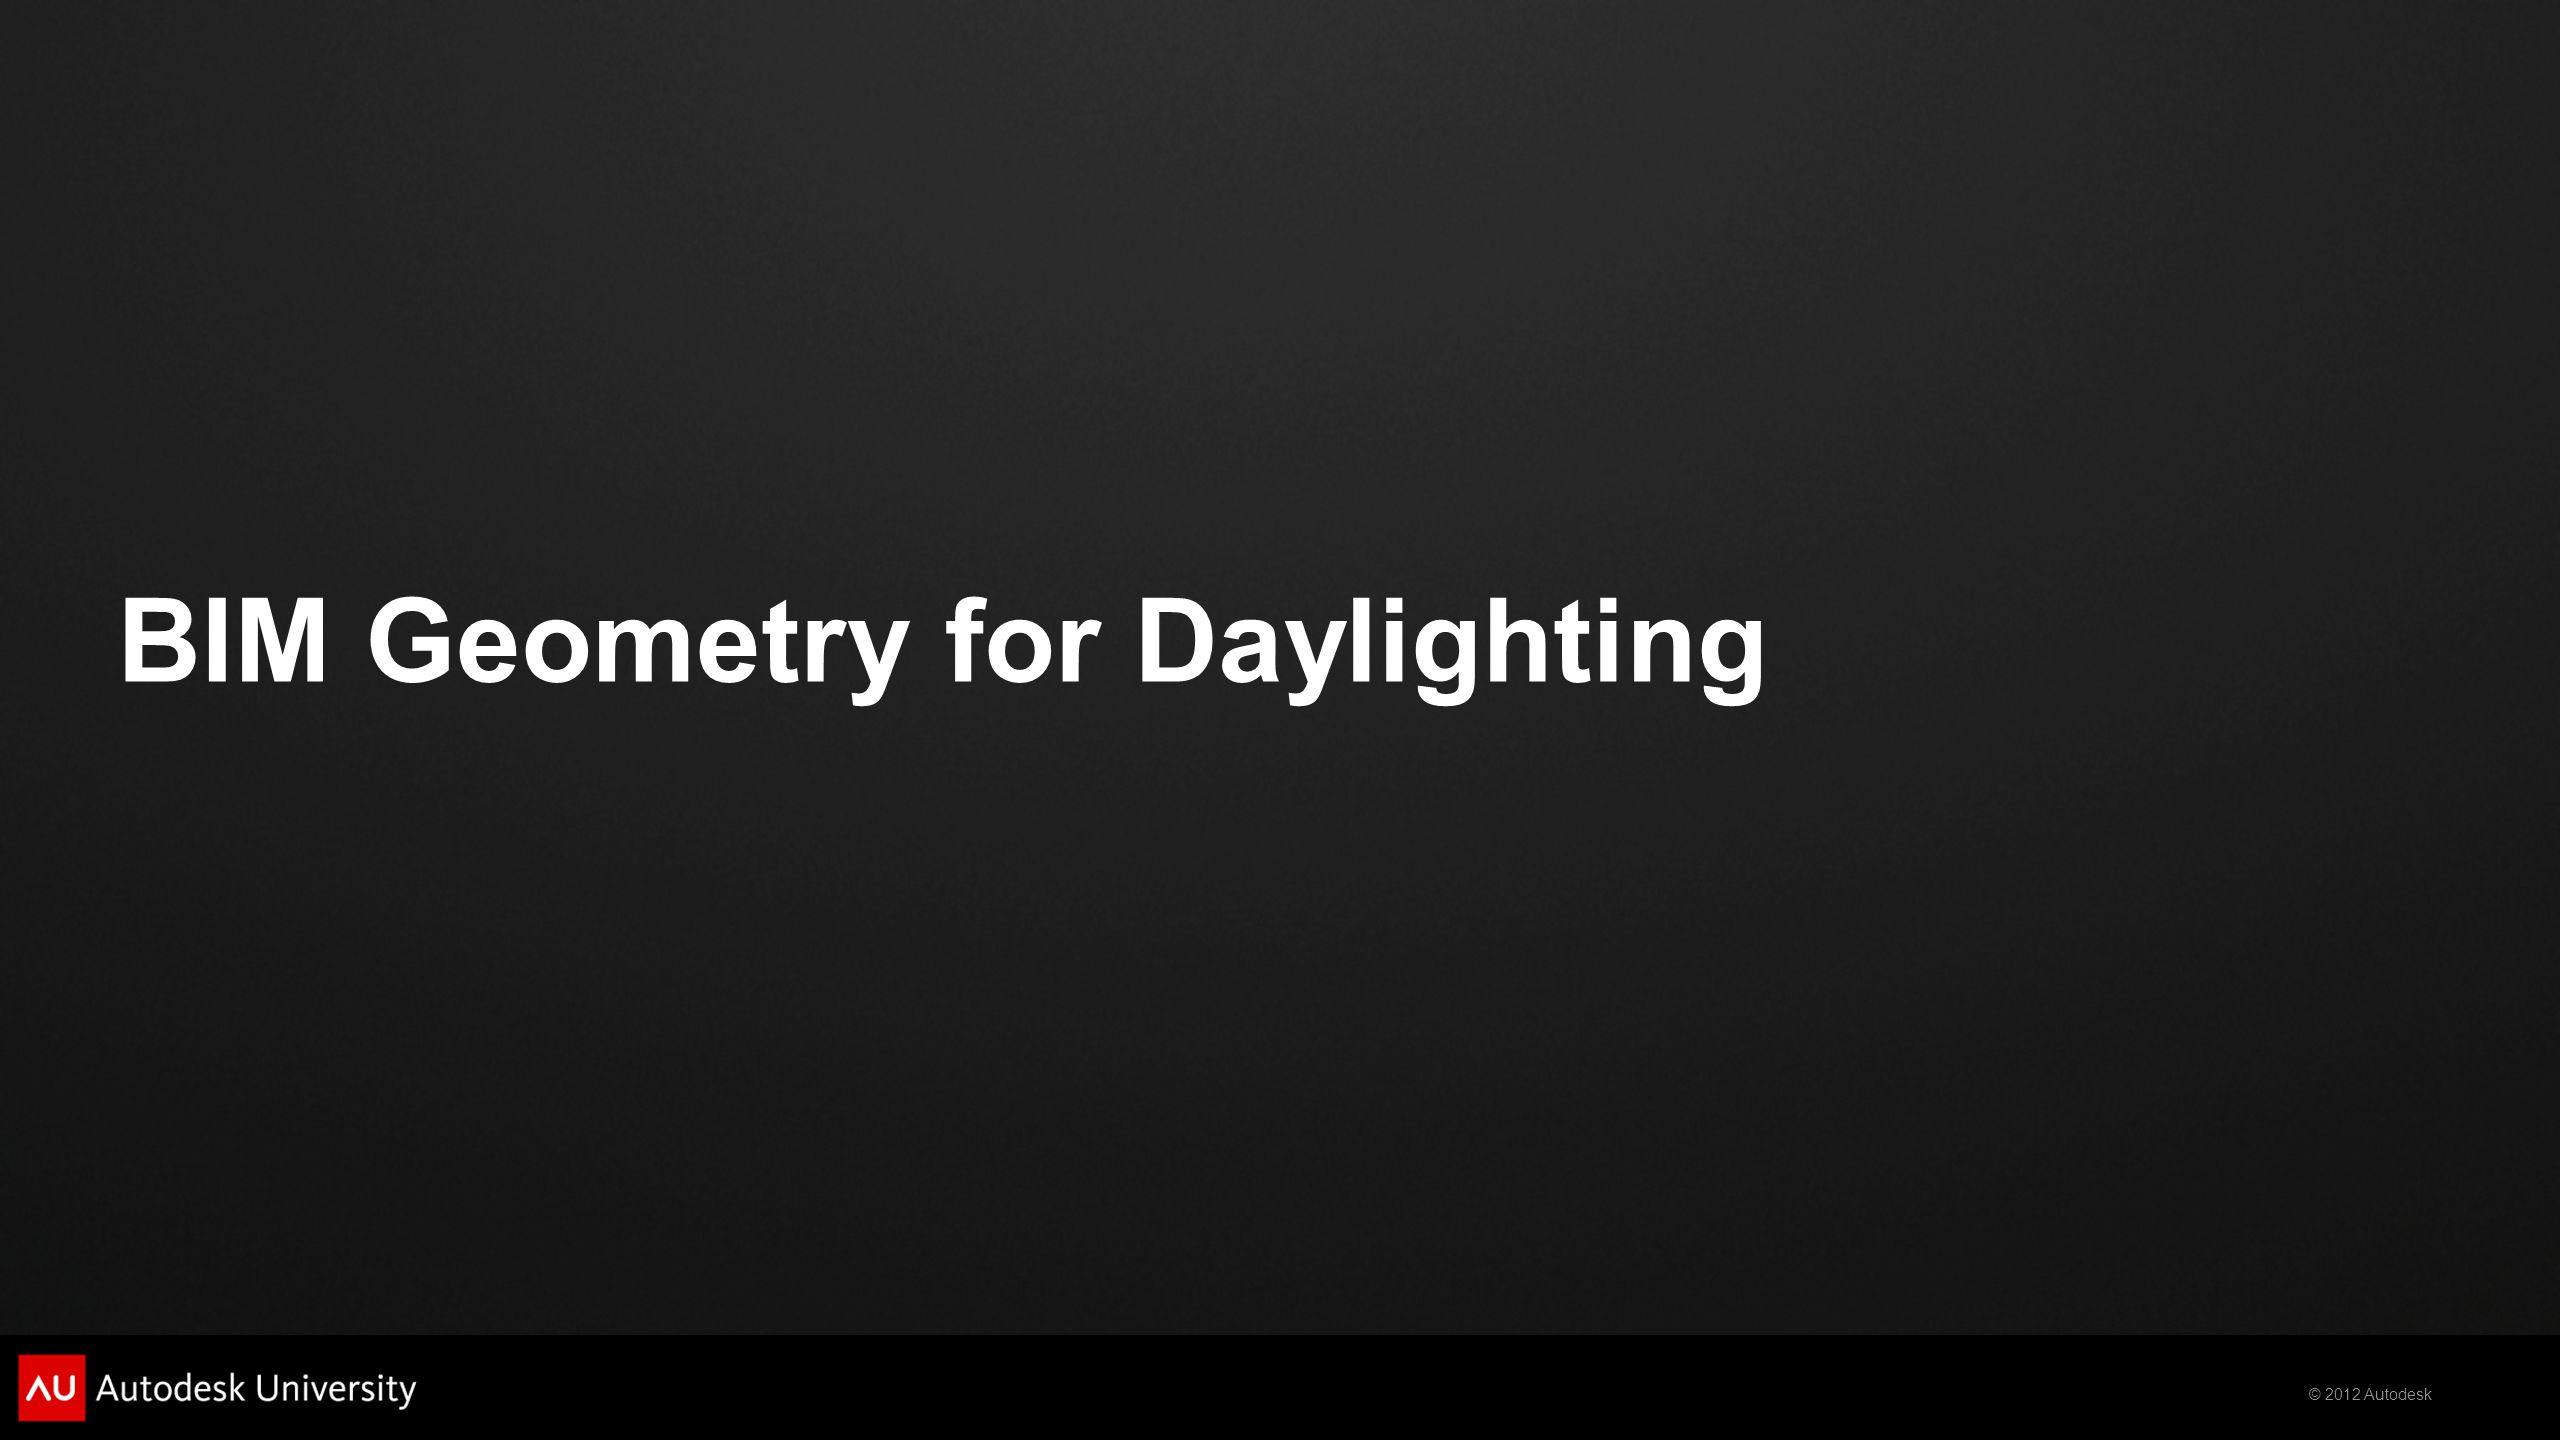 © 2012 Autodesk BIM Geometry for Daylighting